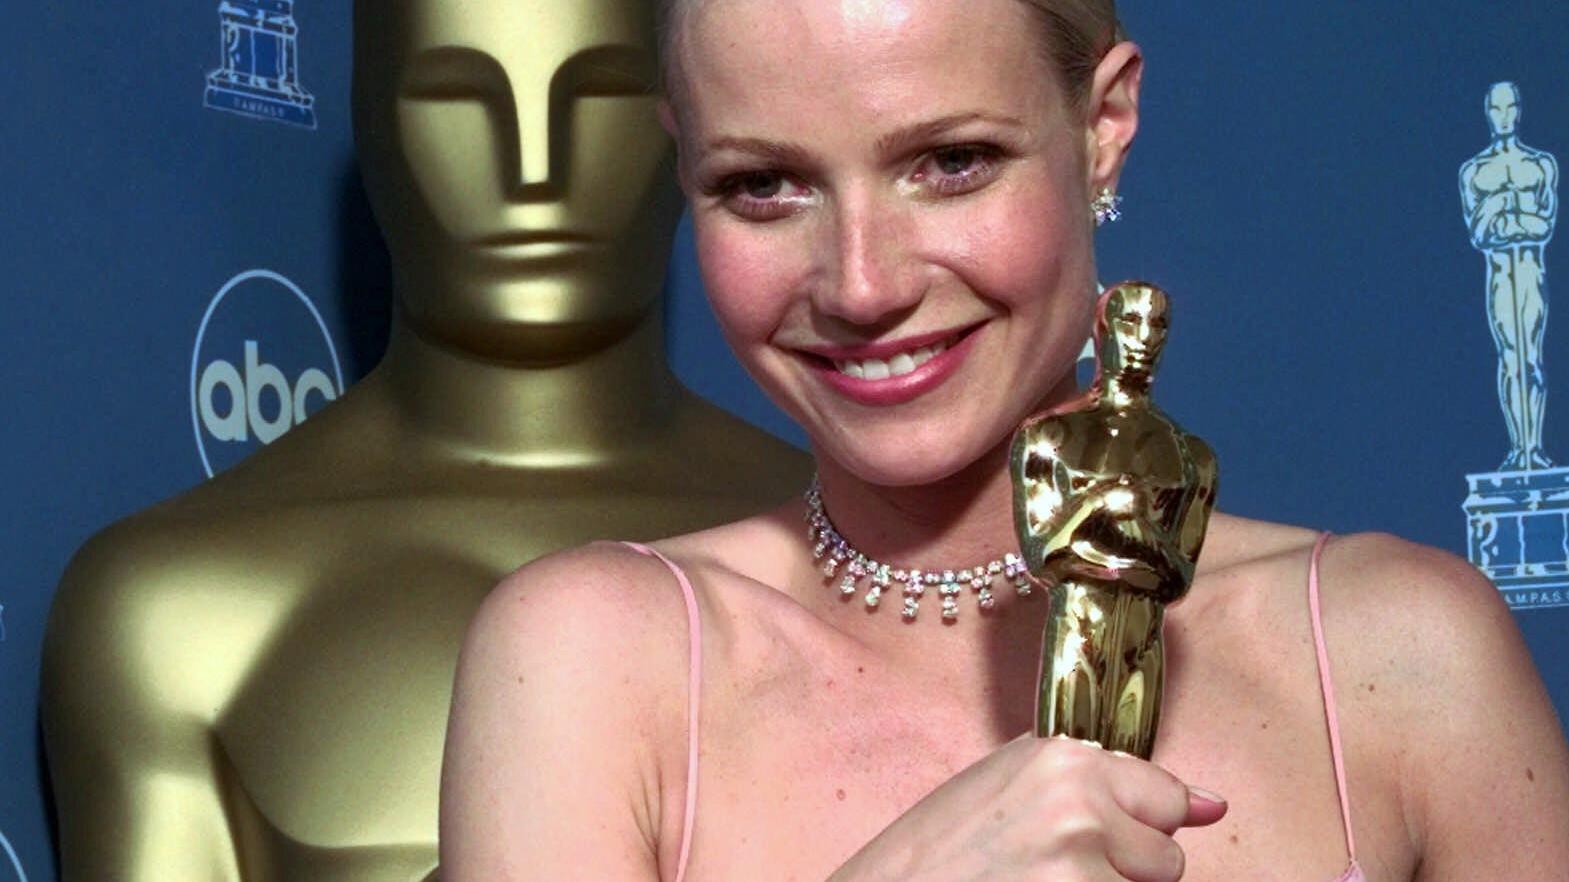 Oscarpreisträgerin Gwyneth Paltrow bringt eigenen Vibrator heraus.